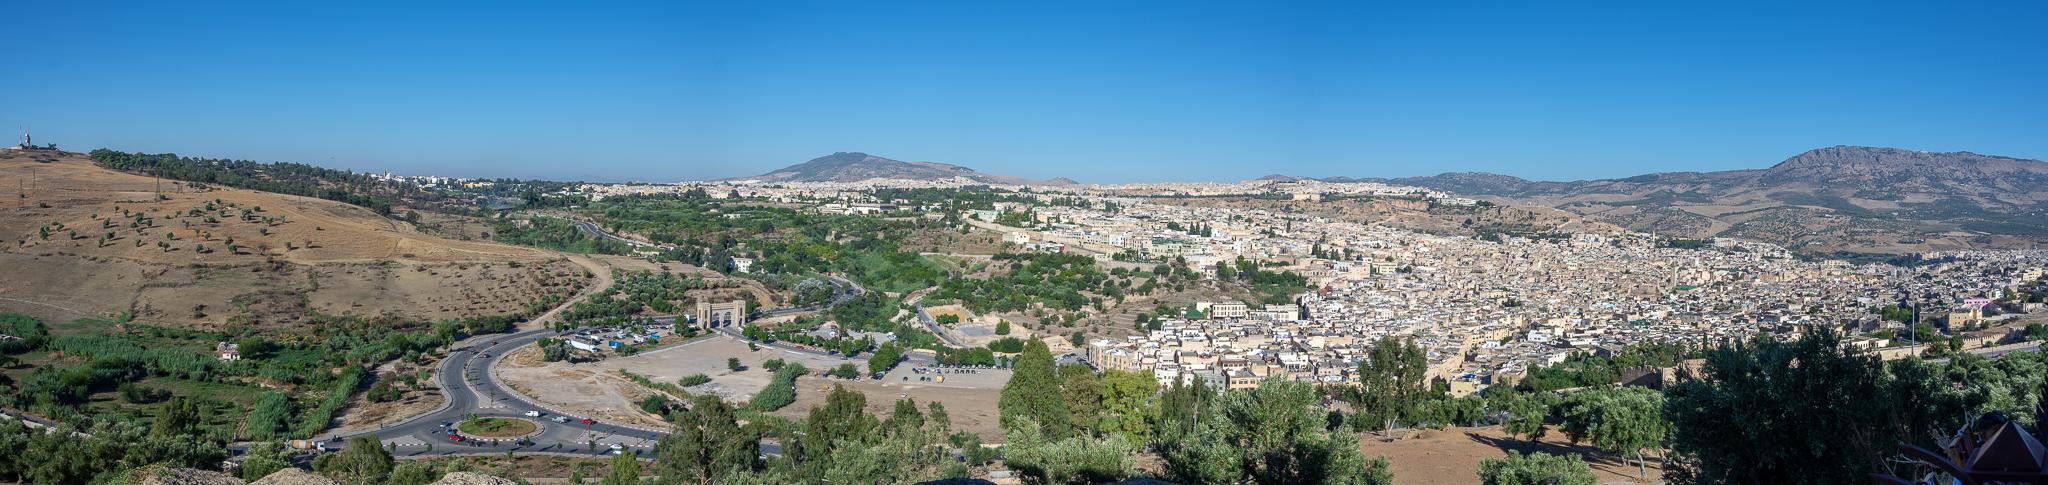 20181003_Marokko_001_1